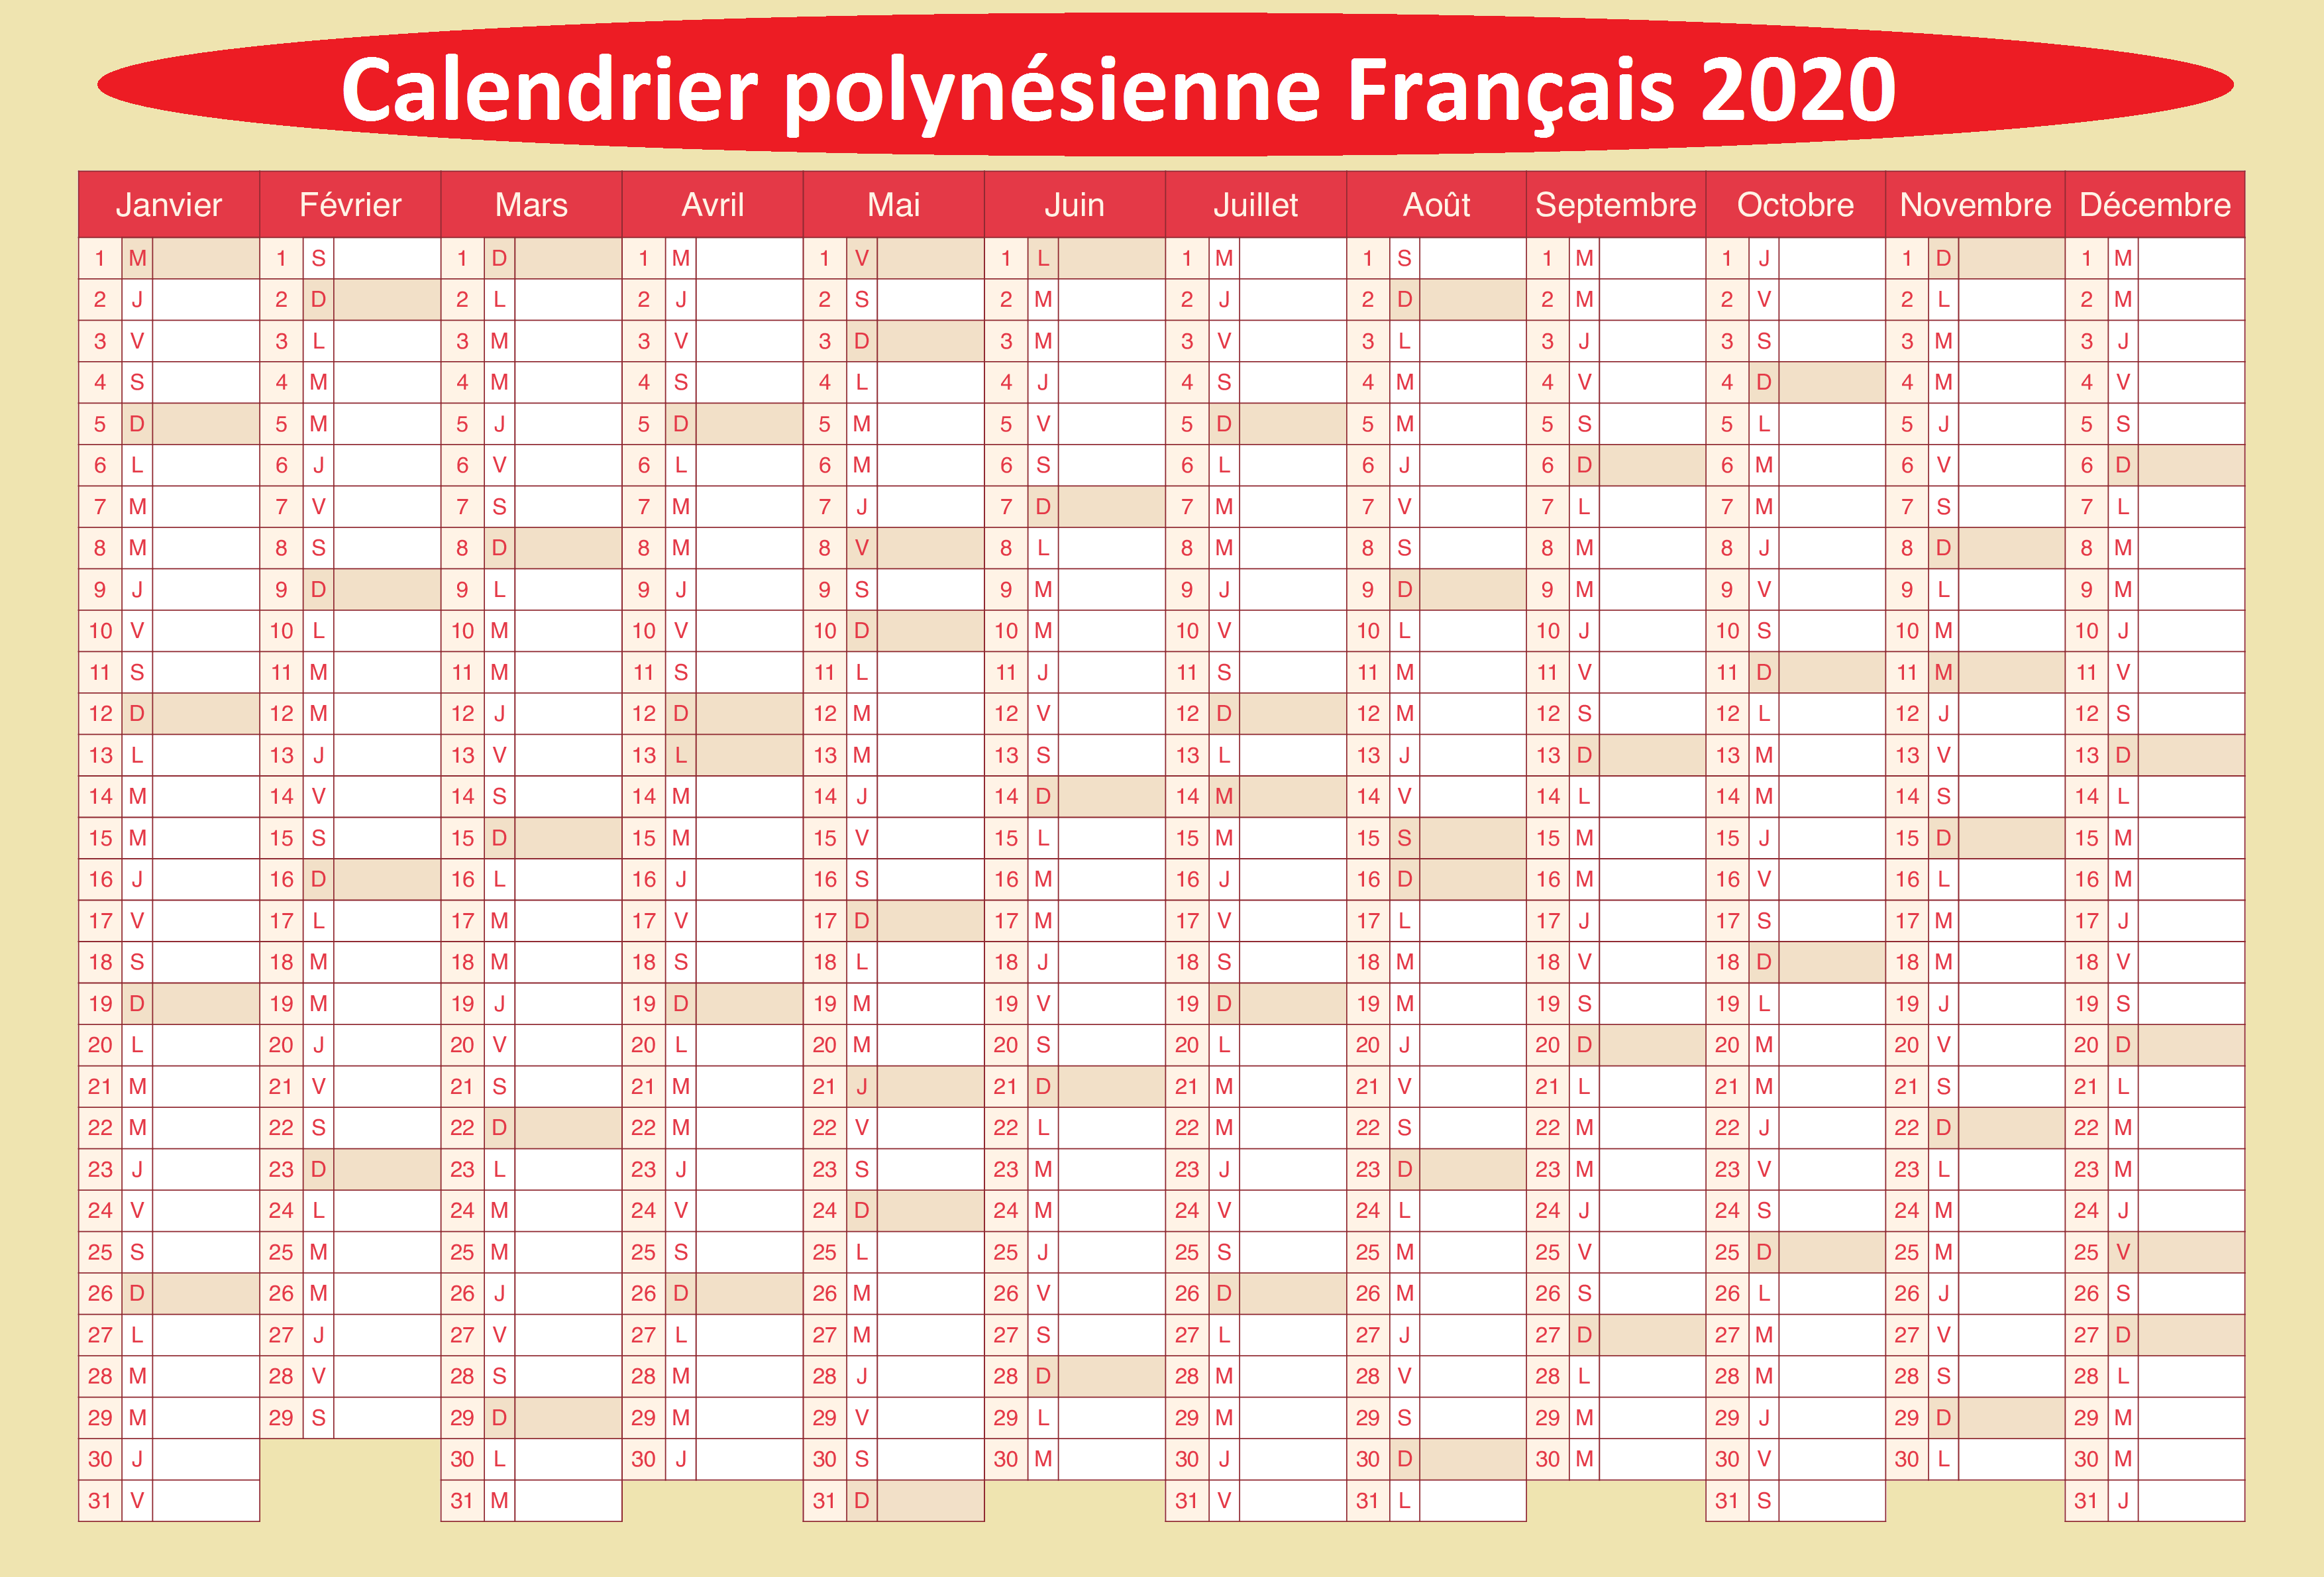 Calendrier Scolaire 2020 et 2021 Air Tahiti Nui